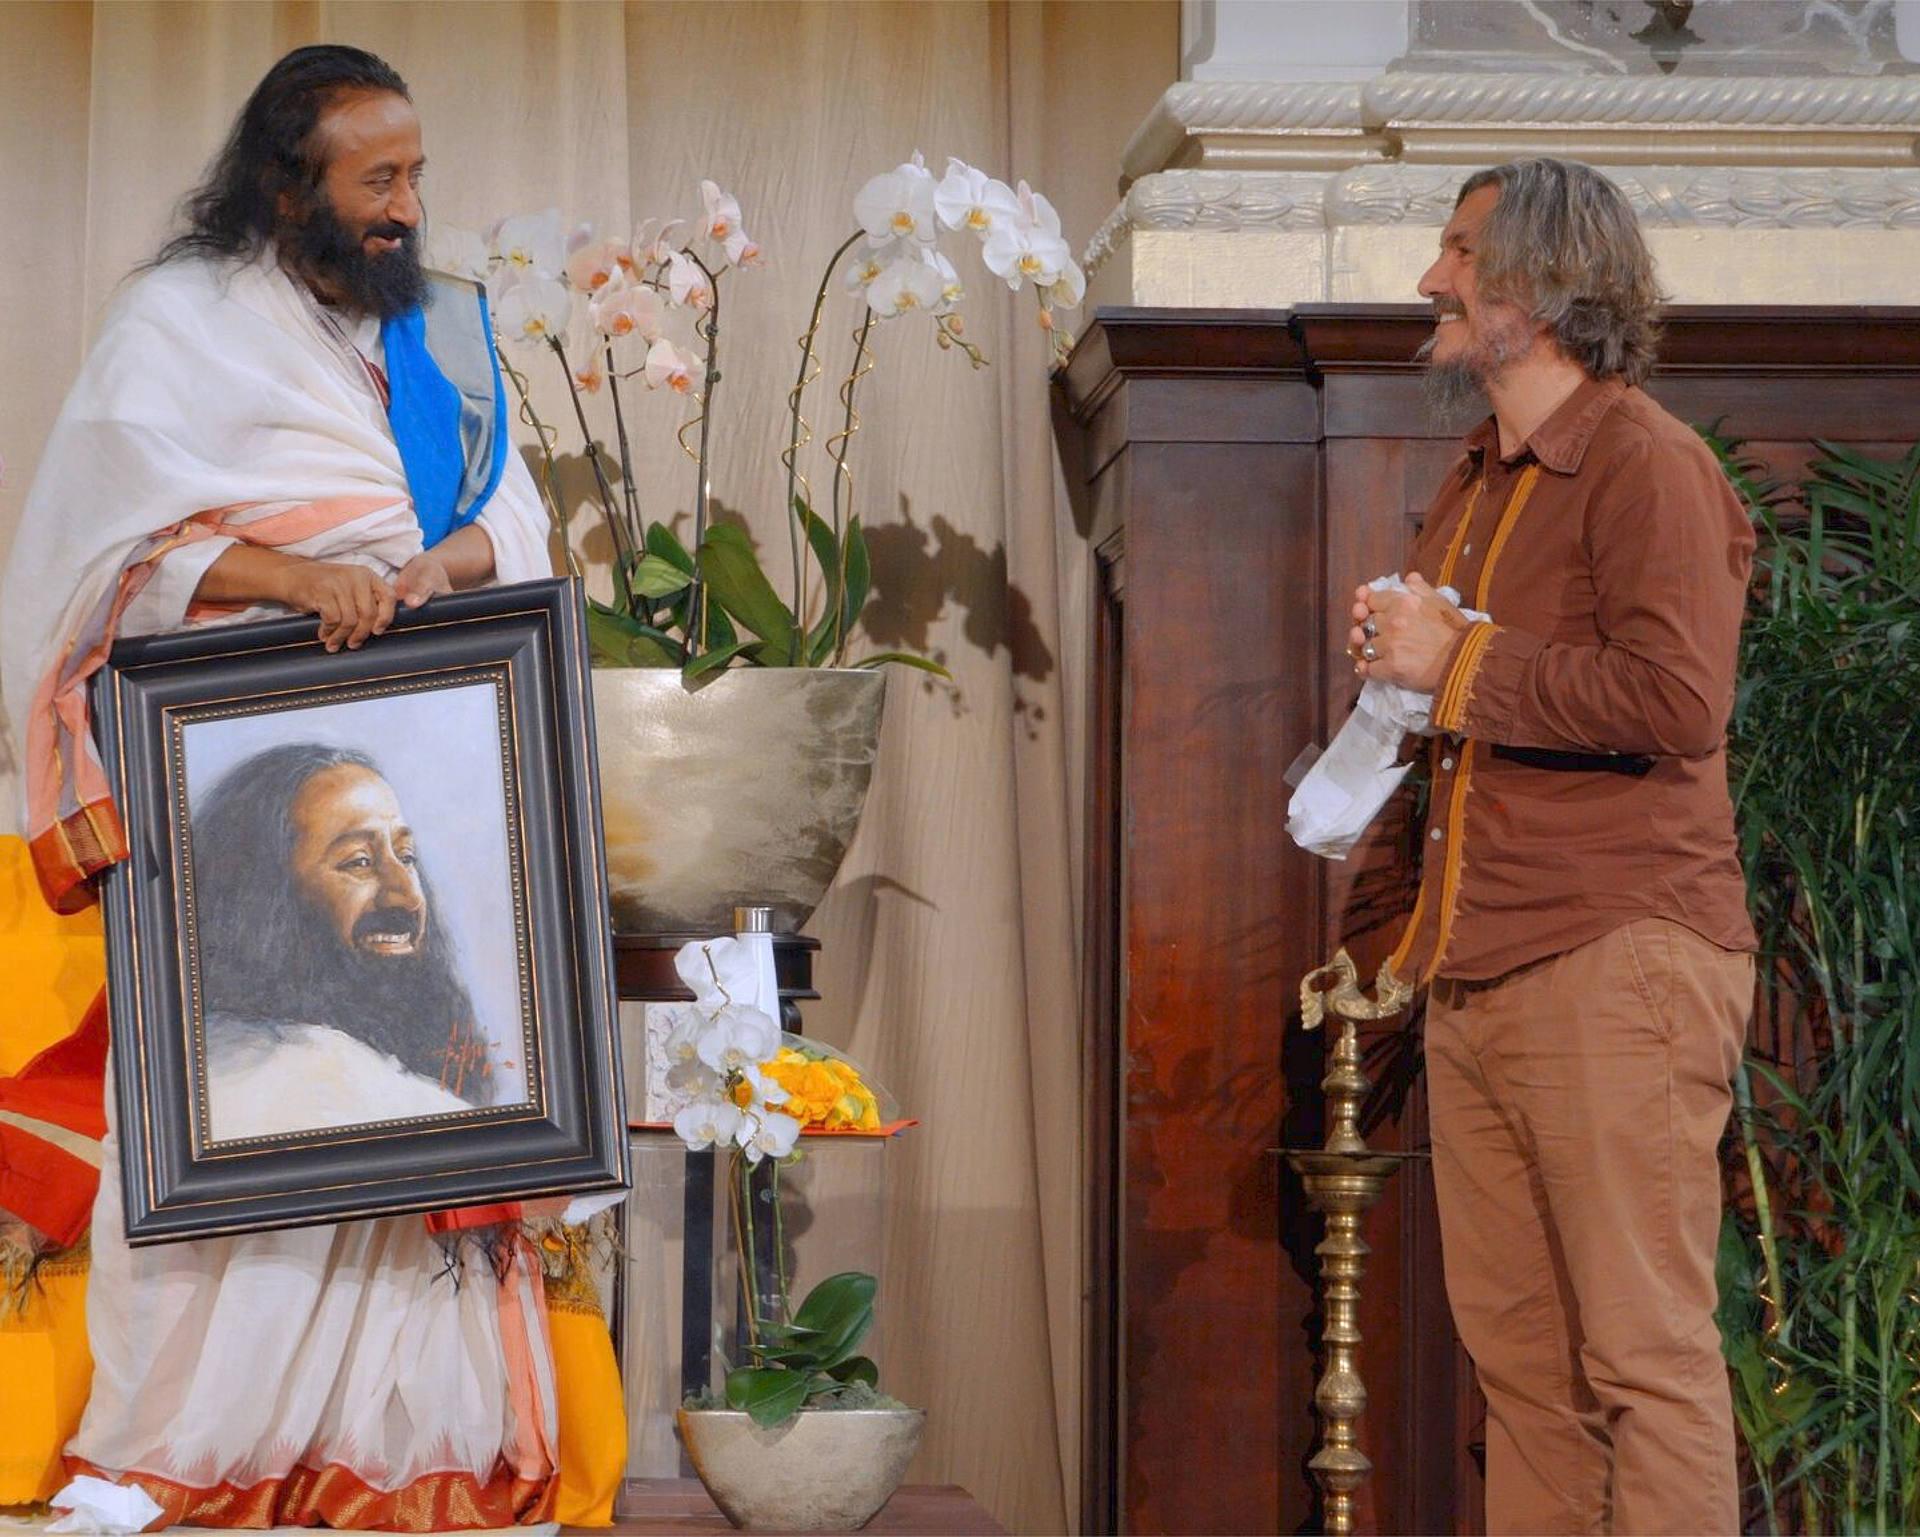 Sri Sri Shankar standing next to portrait by Fabian Perez